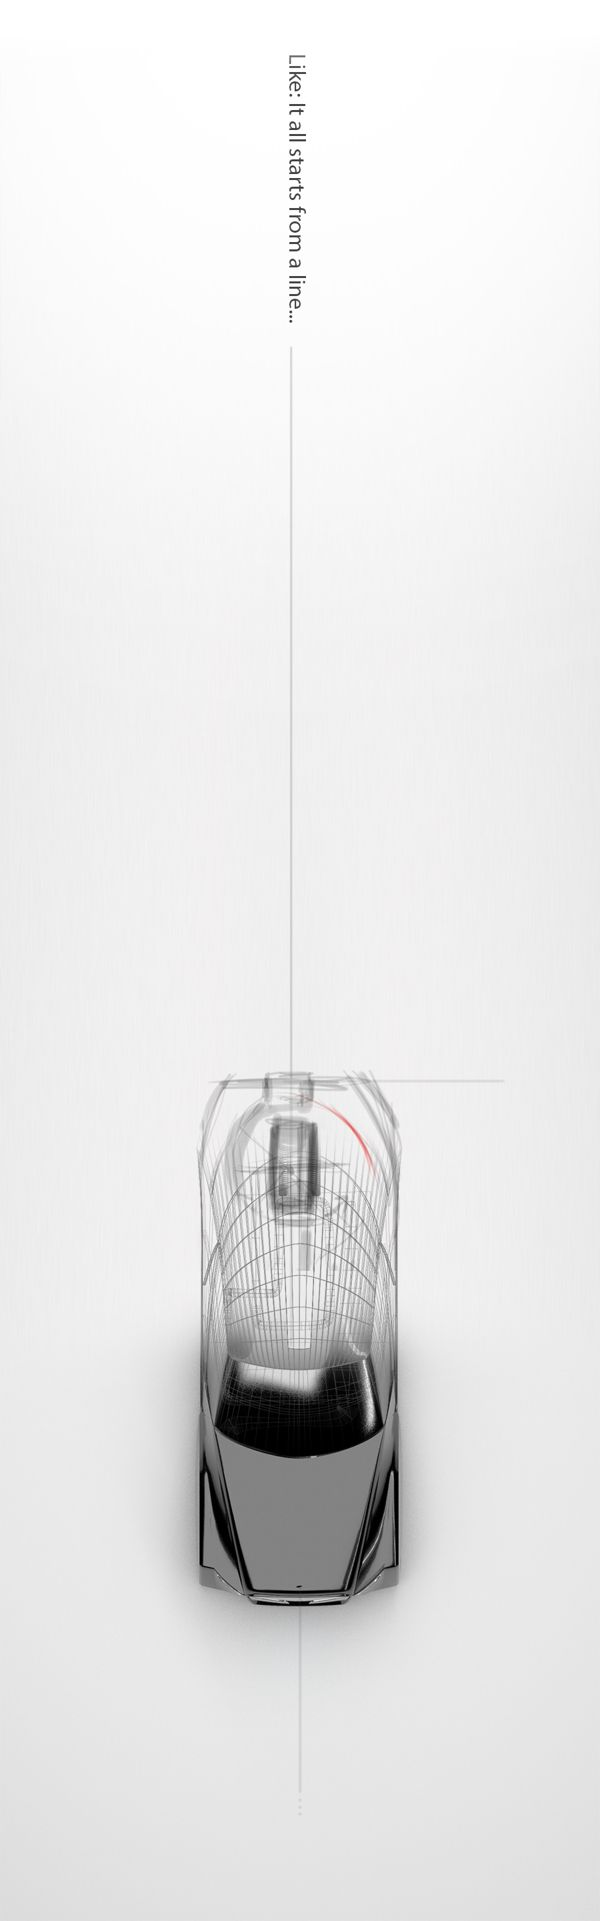 Panthera: A Design Journey on Behance